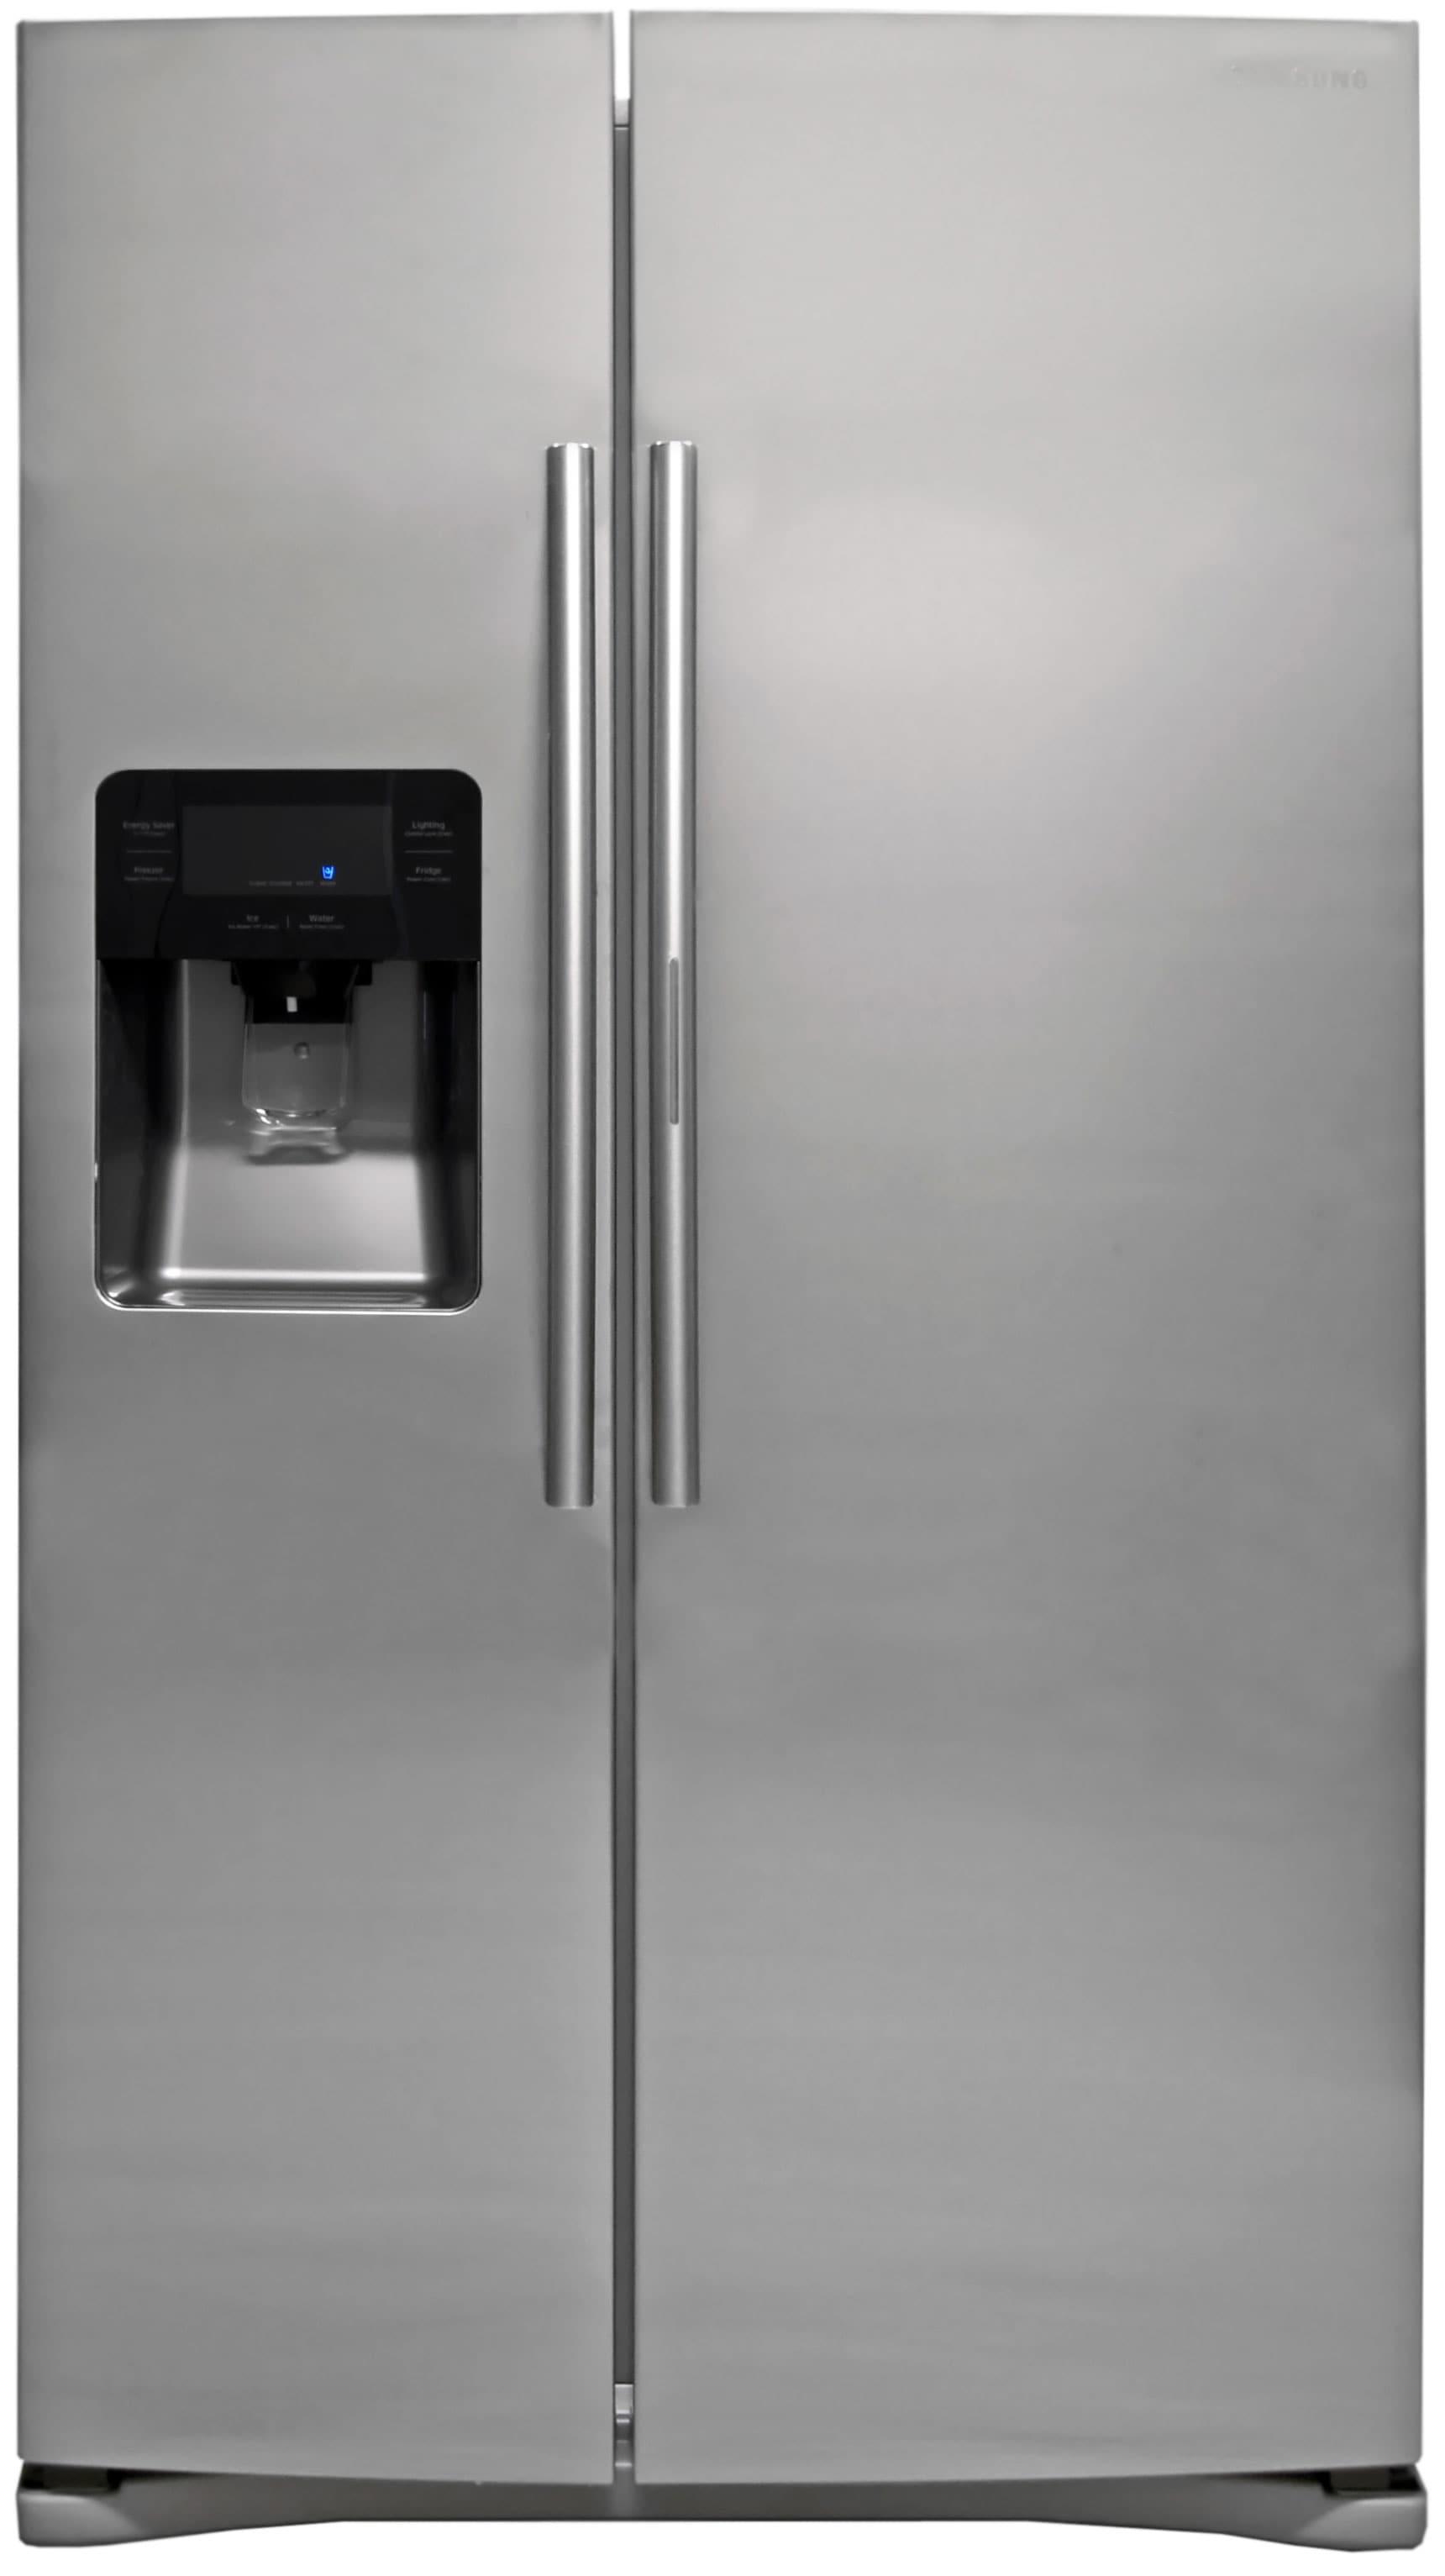 The Samsung RH25H5611SR is a straightforward side-by-side... with door-in-door storage!